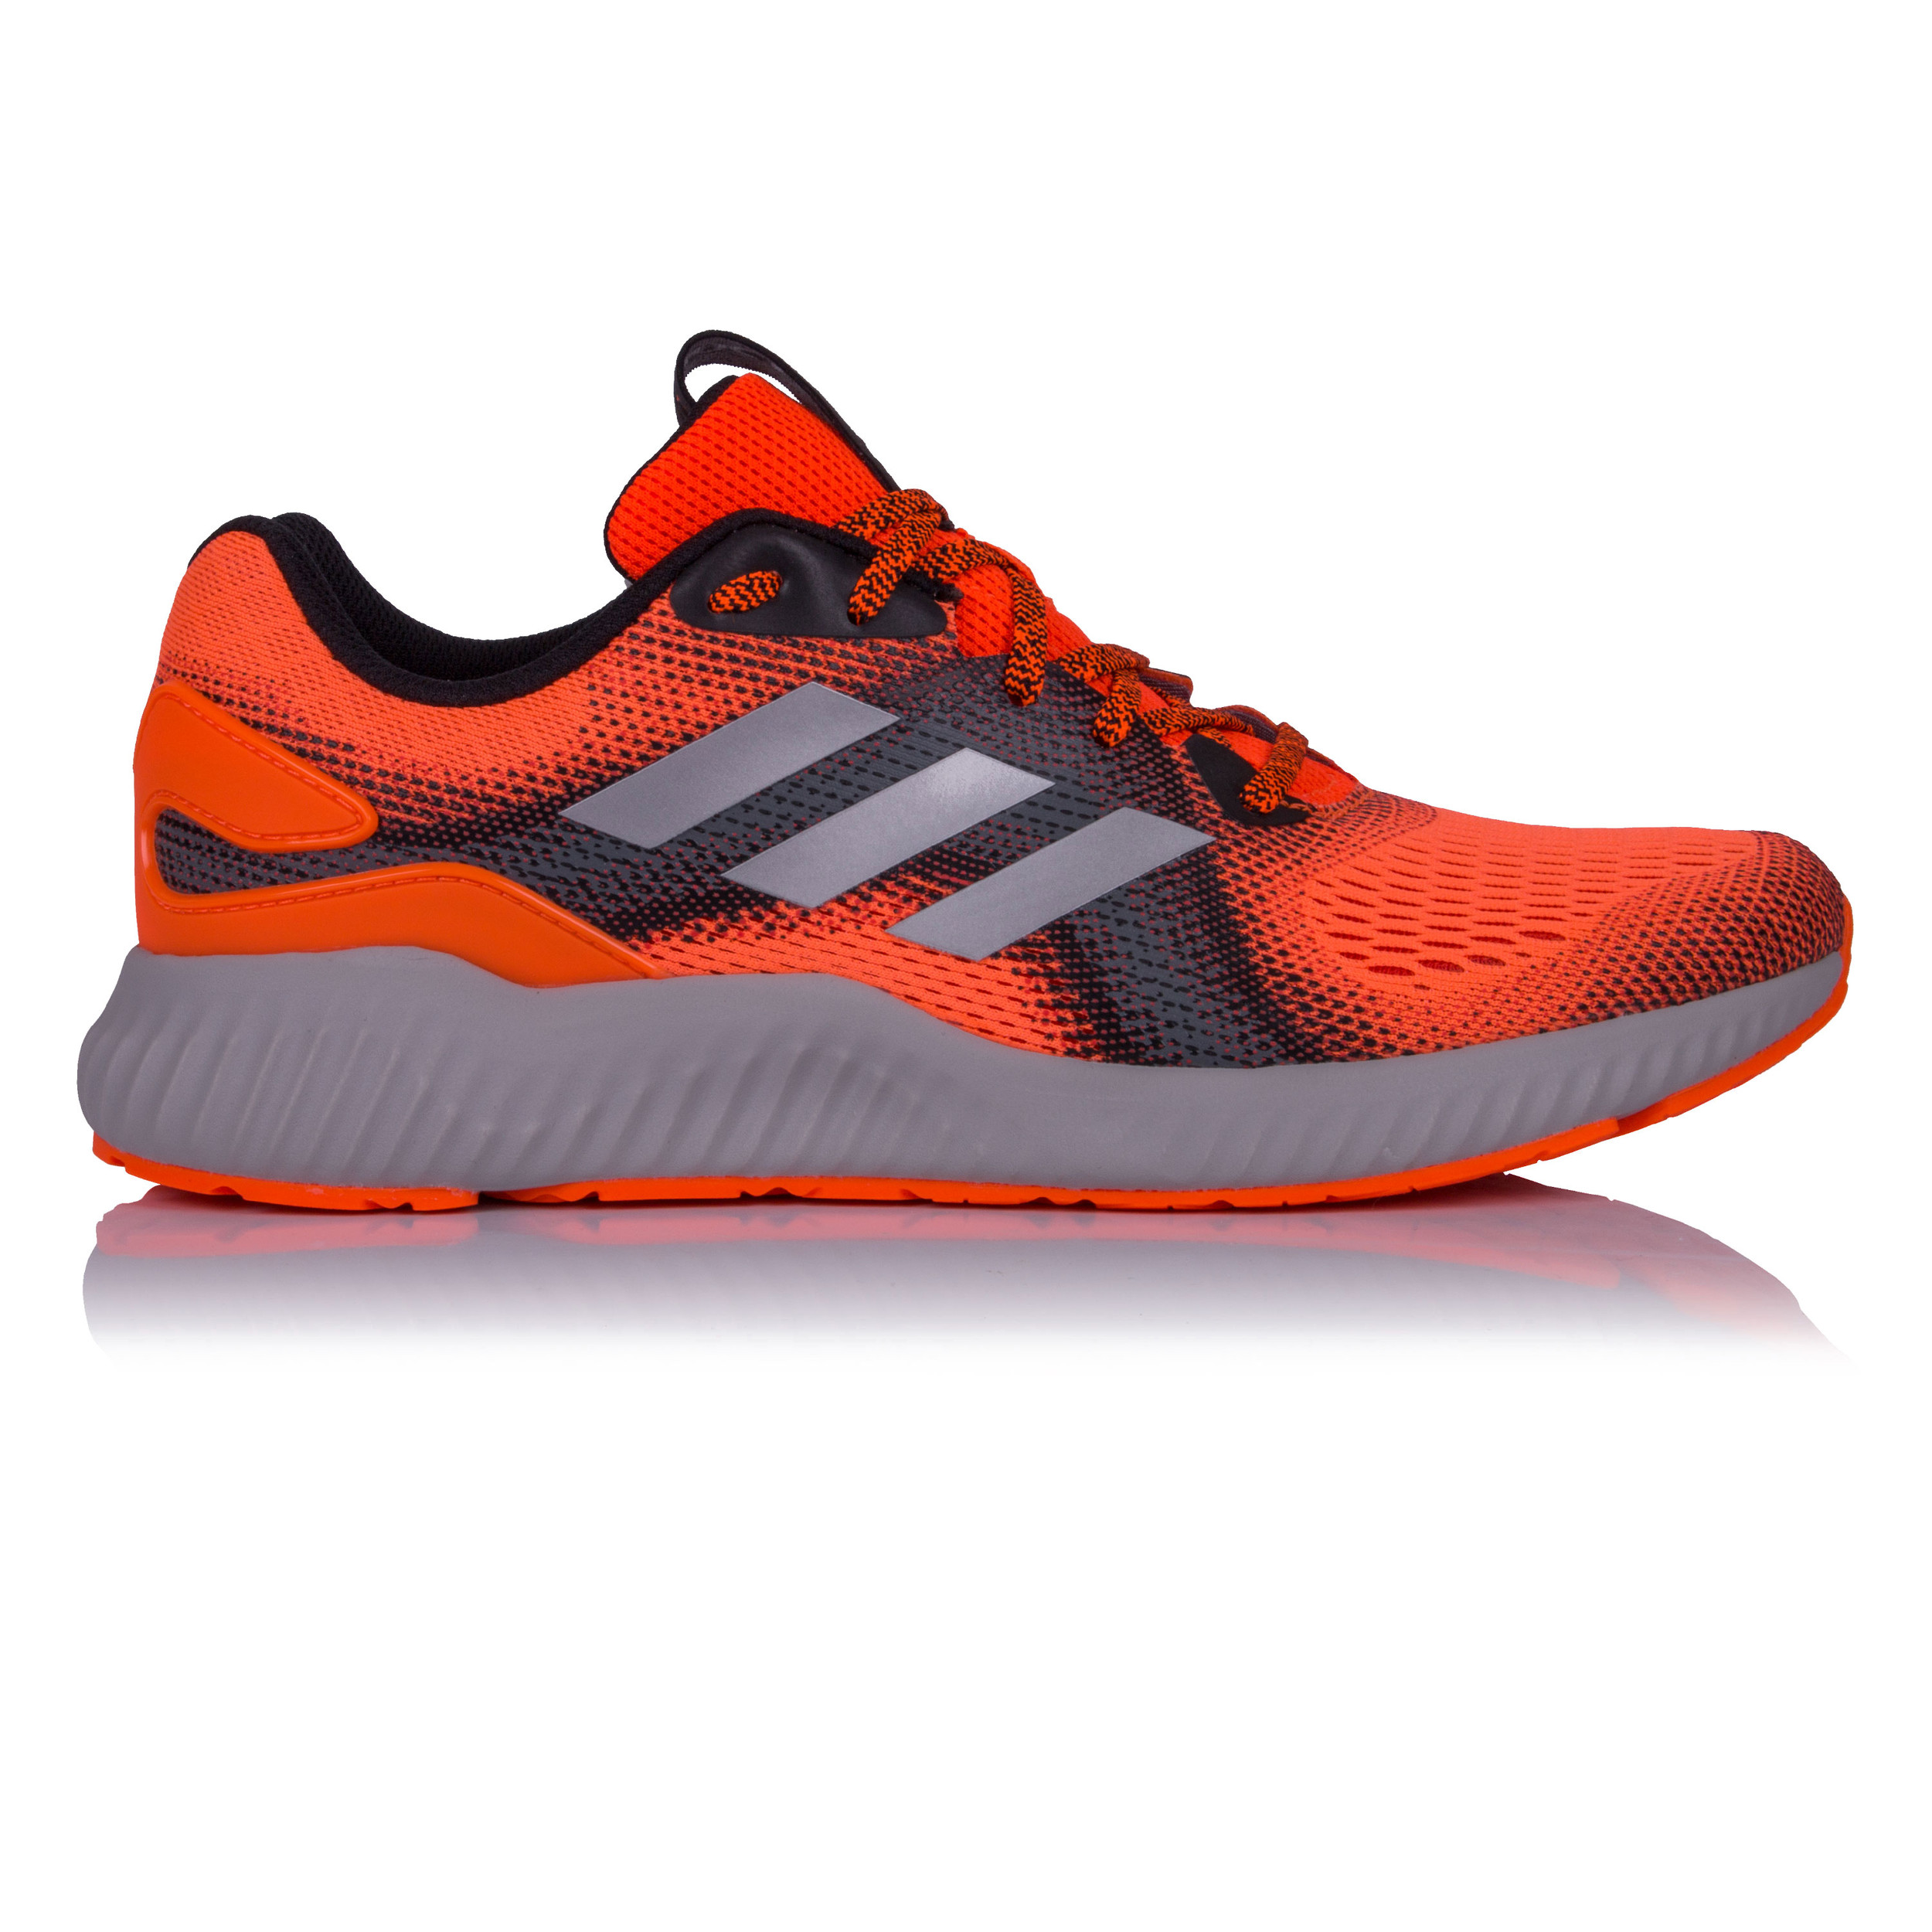 adidas Mens Aerobounce pr Running Shoes Trainers Sneakers Orange Sports